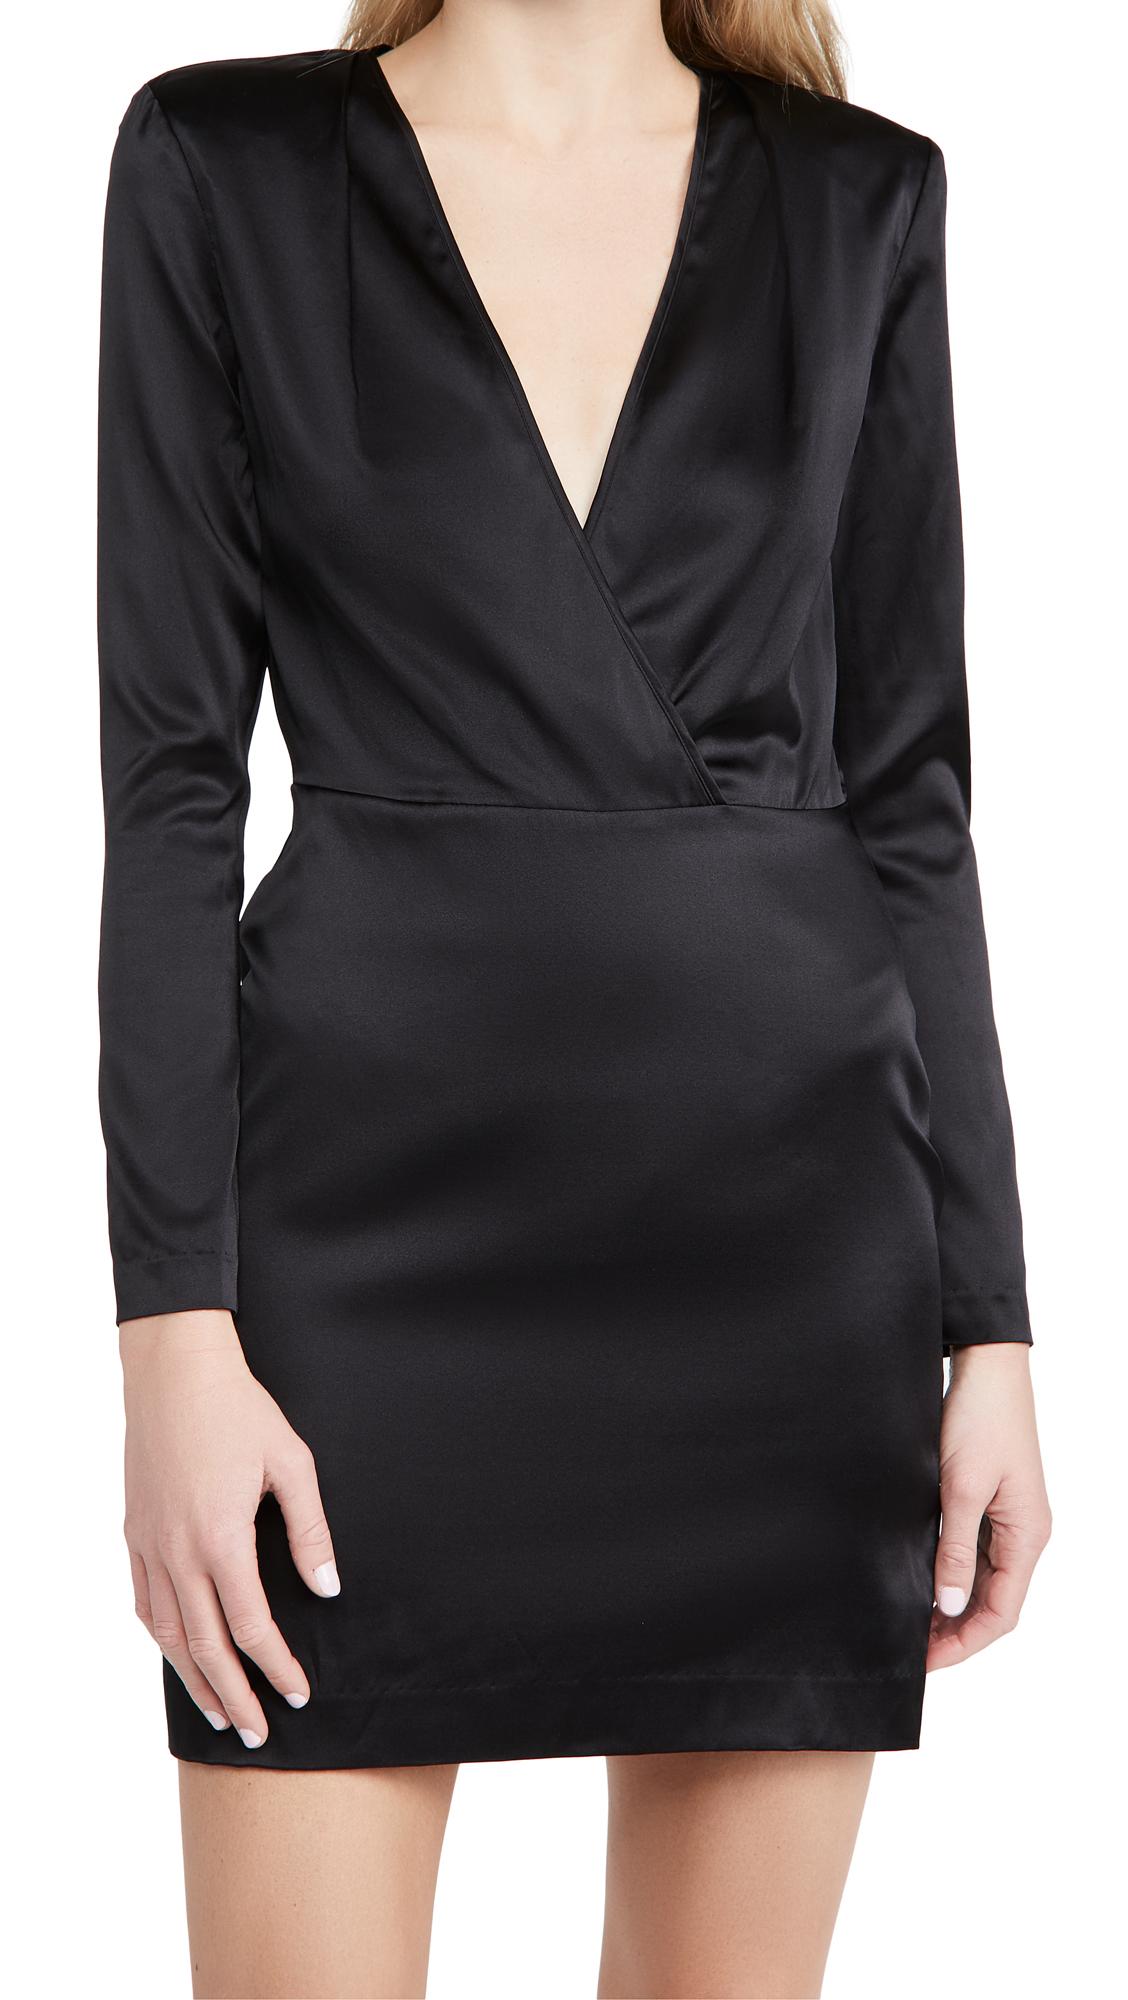 L'AGENCE Kailyn Deep V Dress